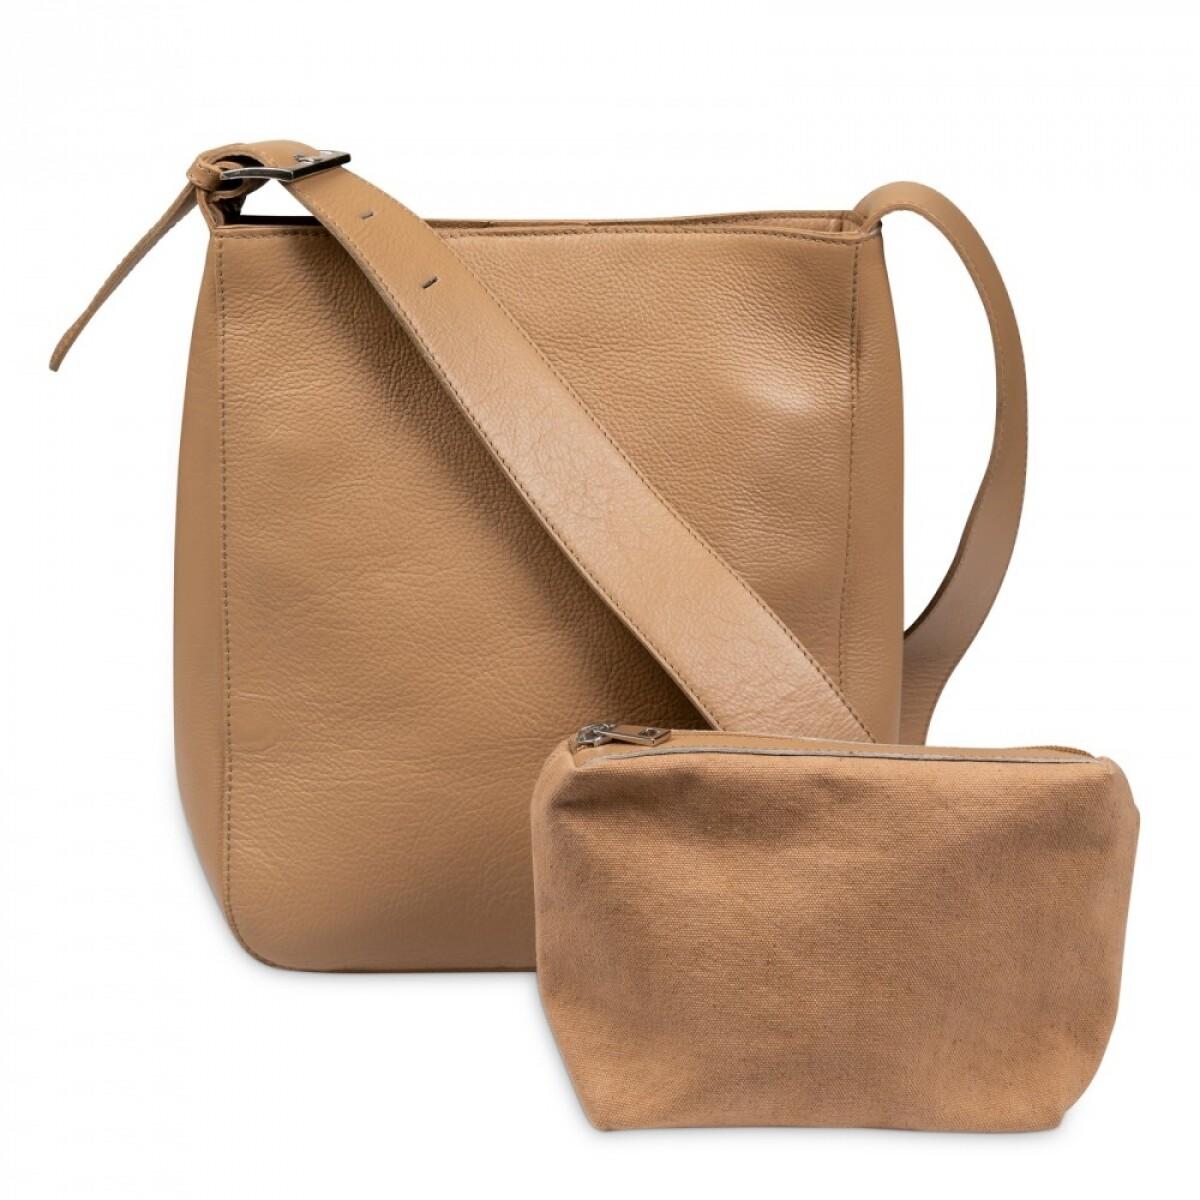 YAYA Leather Bag & purse BROWN CLAY